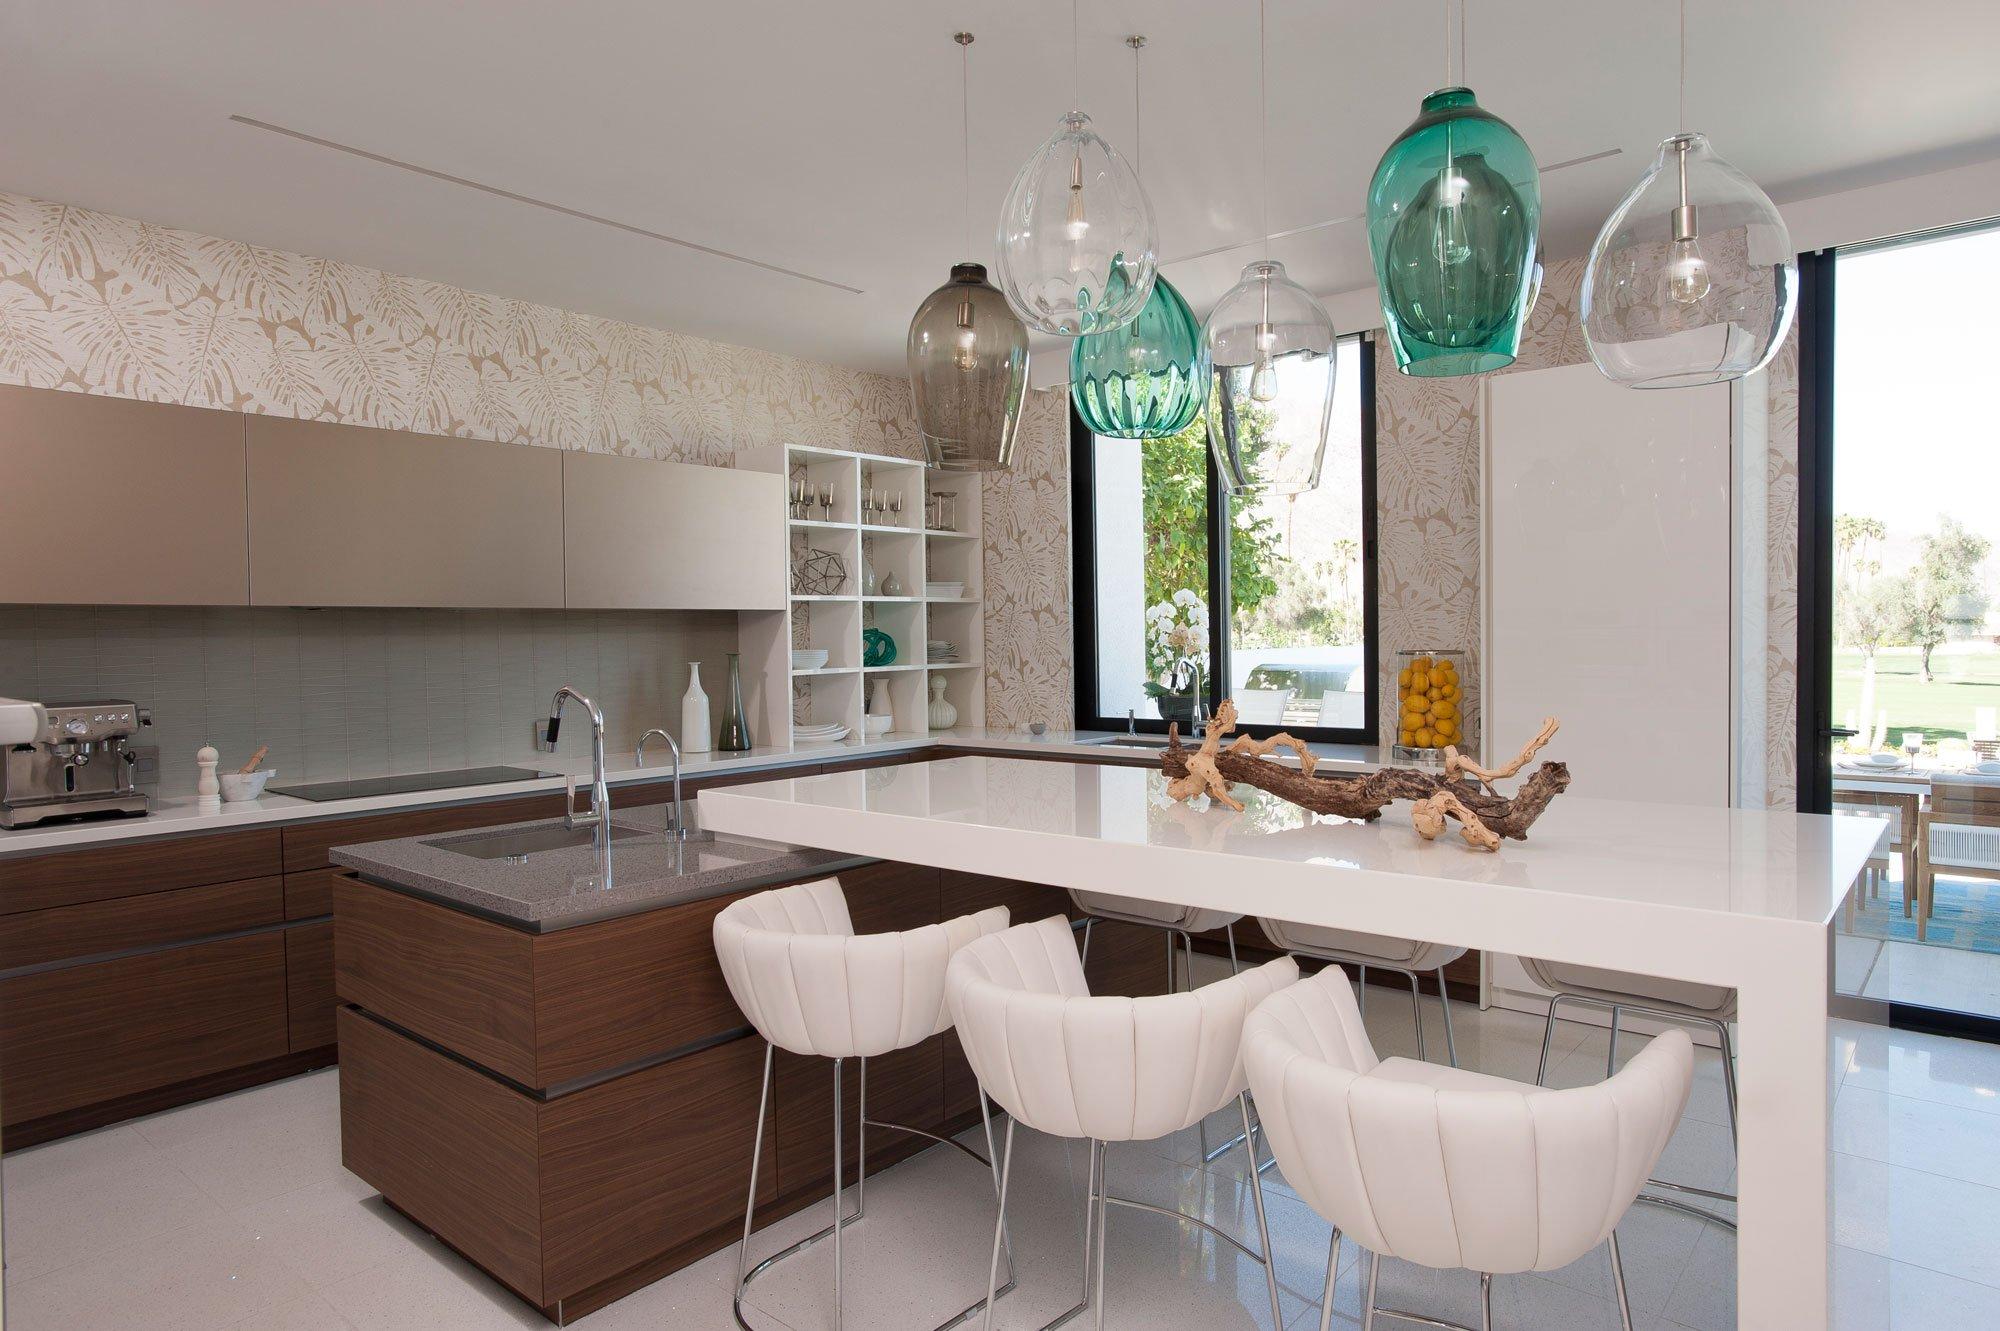 Eggersmann Kitchen by Christopher Kennedy